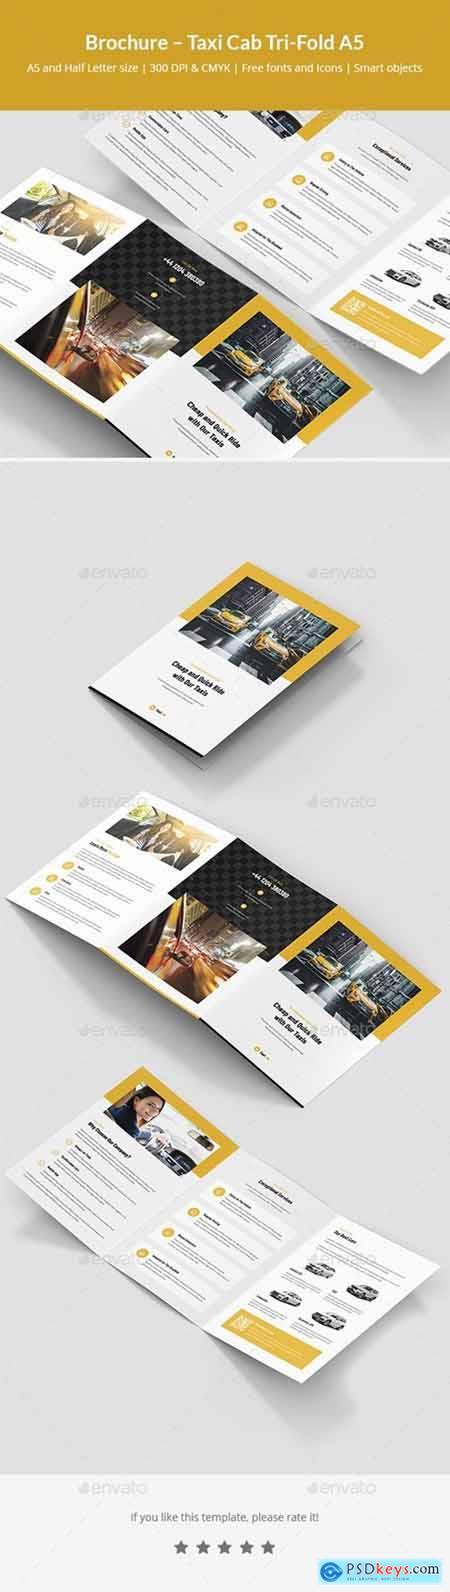 Brochure – Taxi Cab Tri-Fold A5 24821752